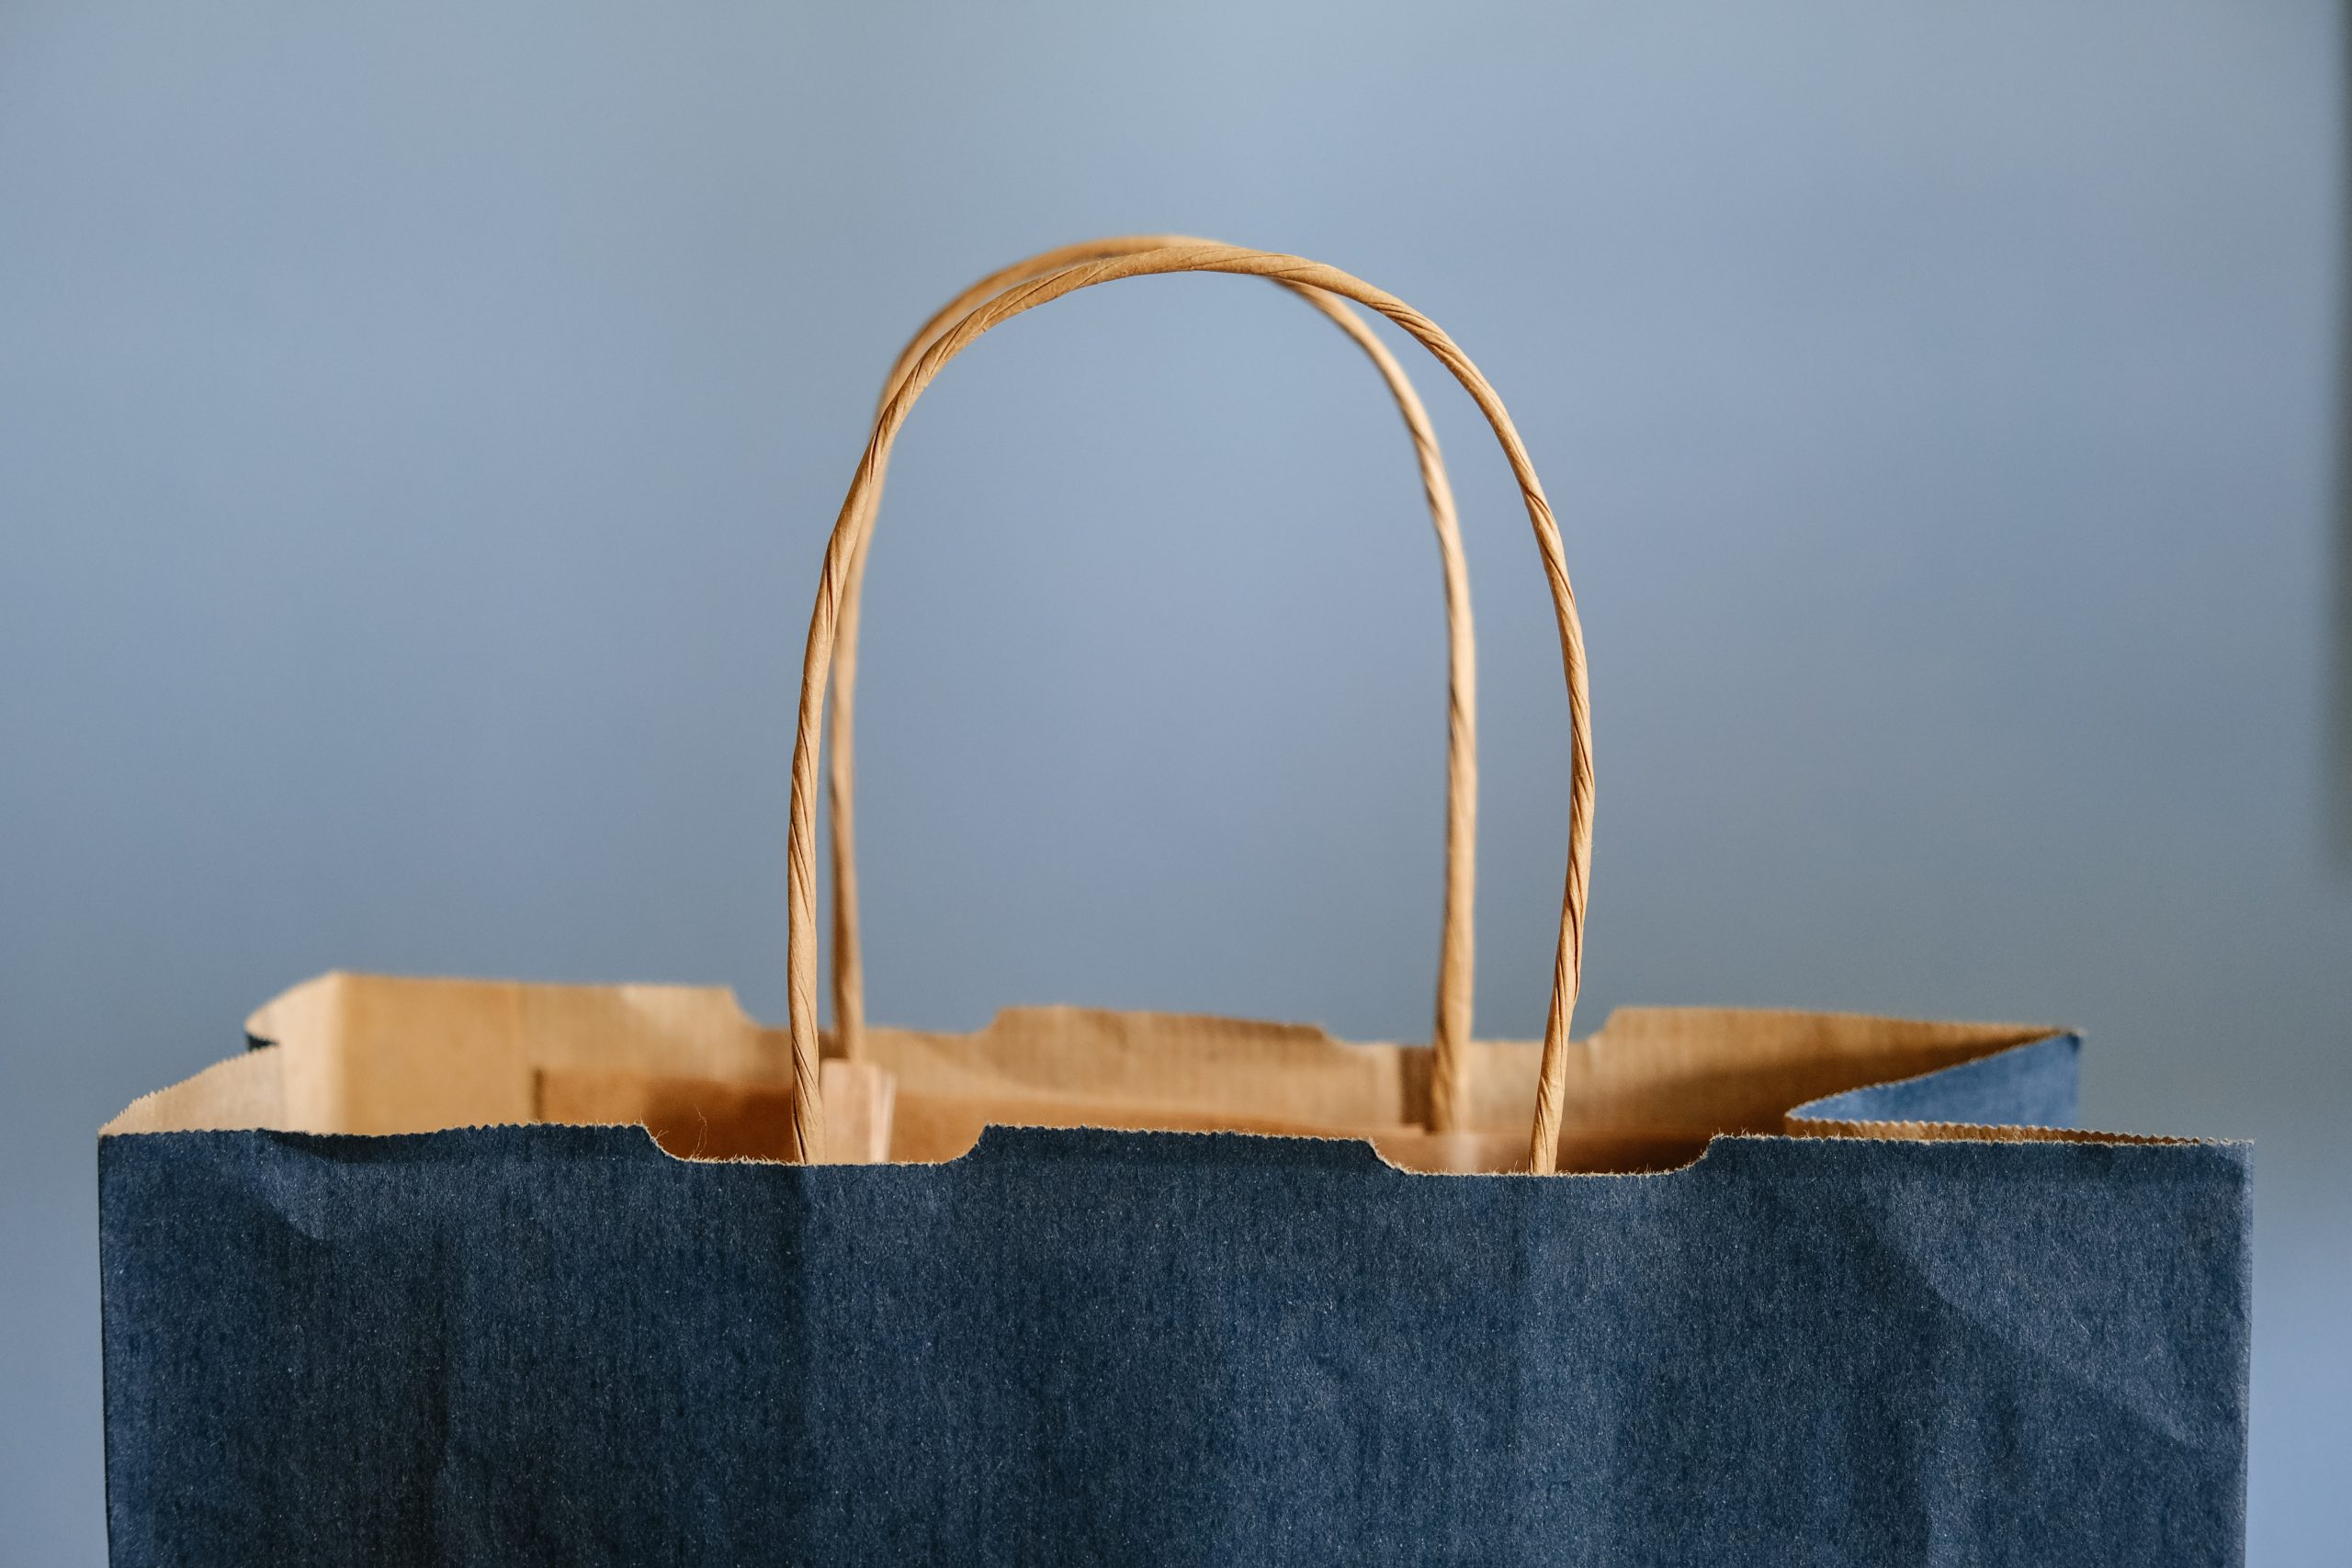 Podcast Episode Twenty-Six: Grab Bag